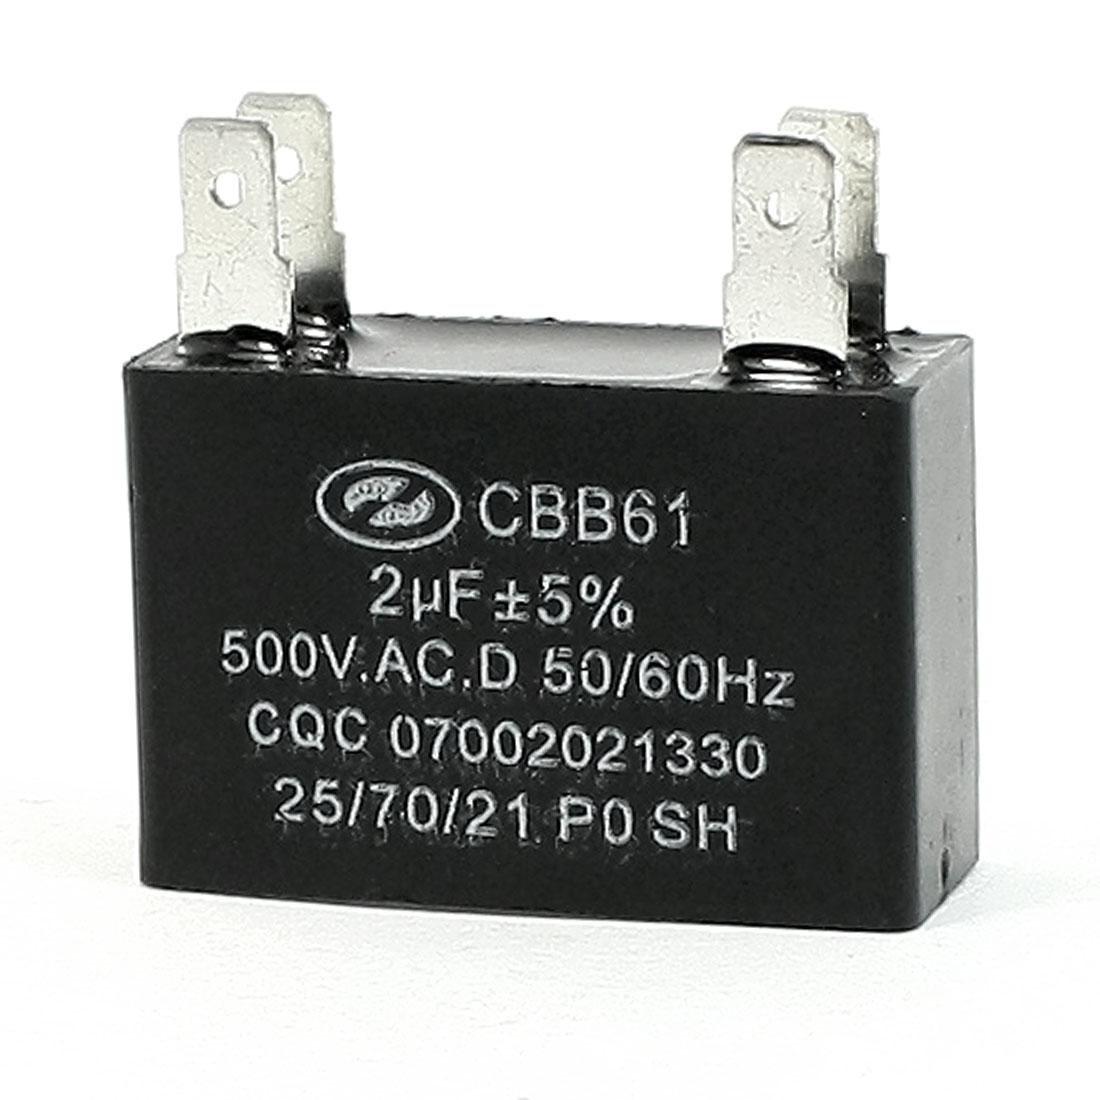 AC 500V 50/60Hz Motor Running PO SH Capacitor 2uF